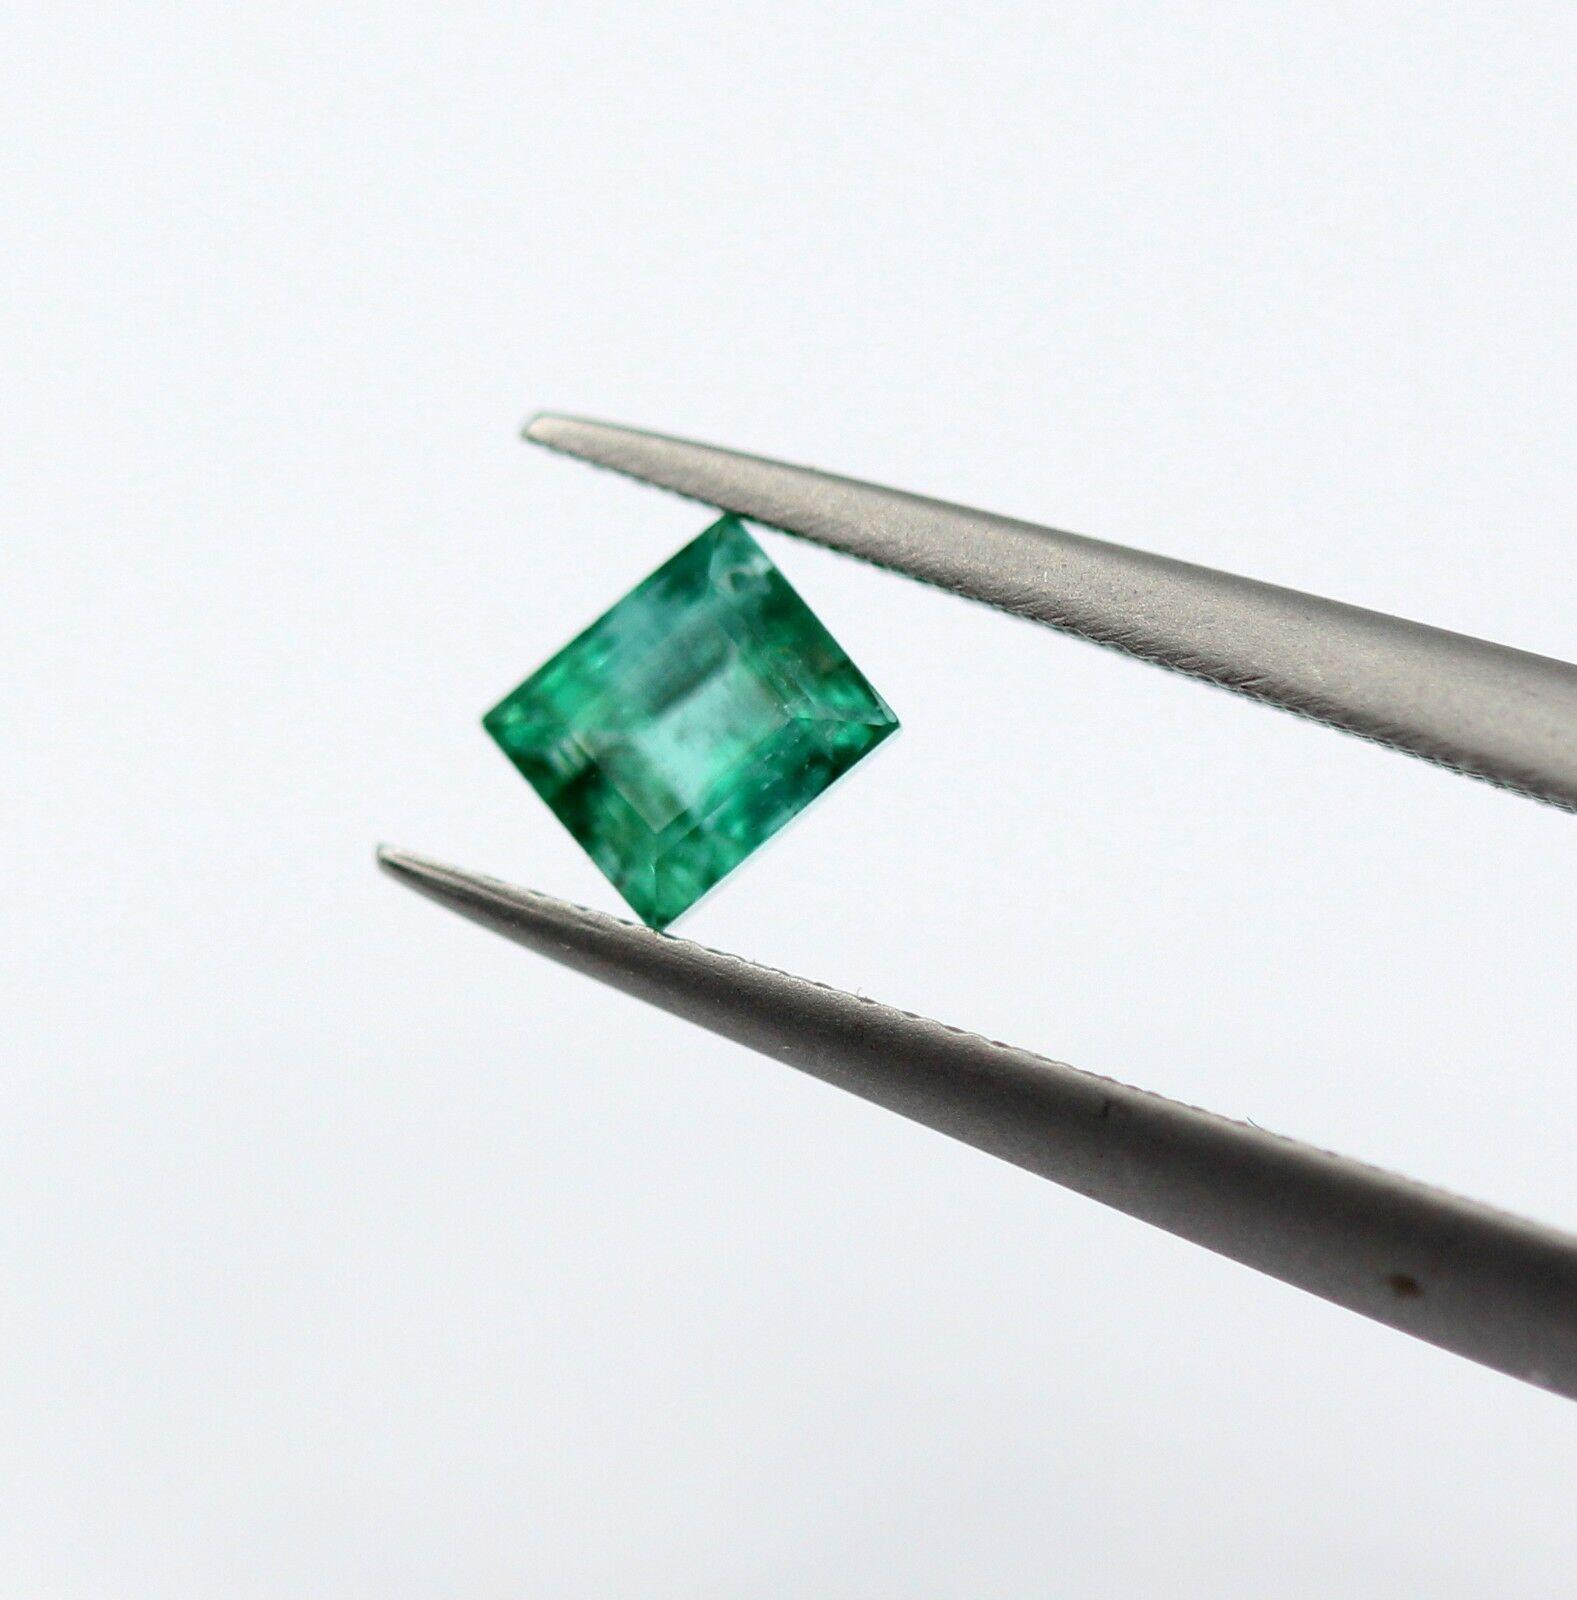 0.36 Ct Emerald Dark Green Color Zambian Princess Cut Natural Gemstone Certified